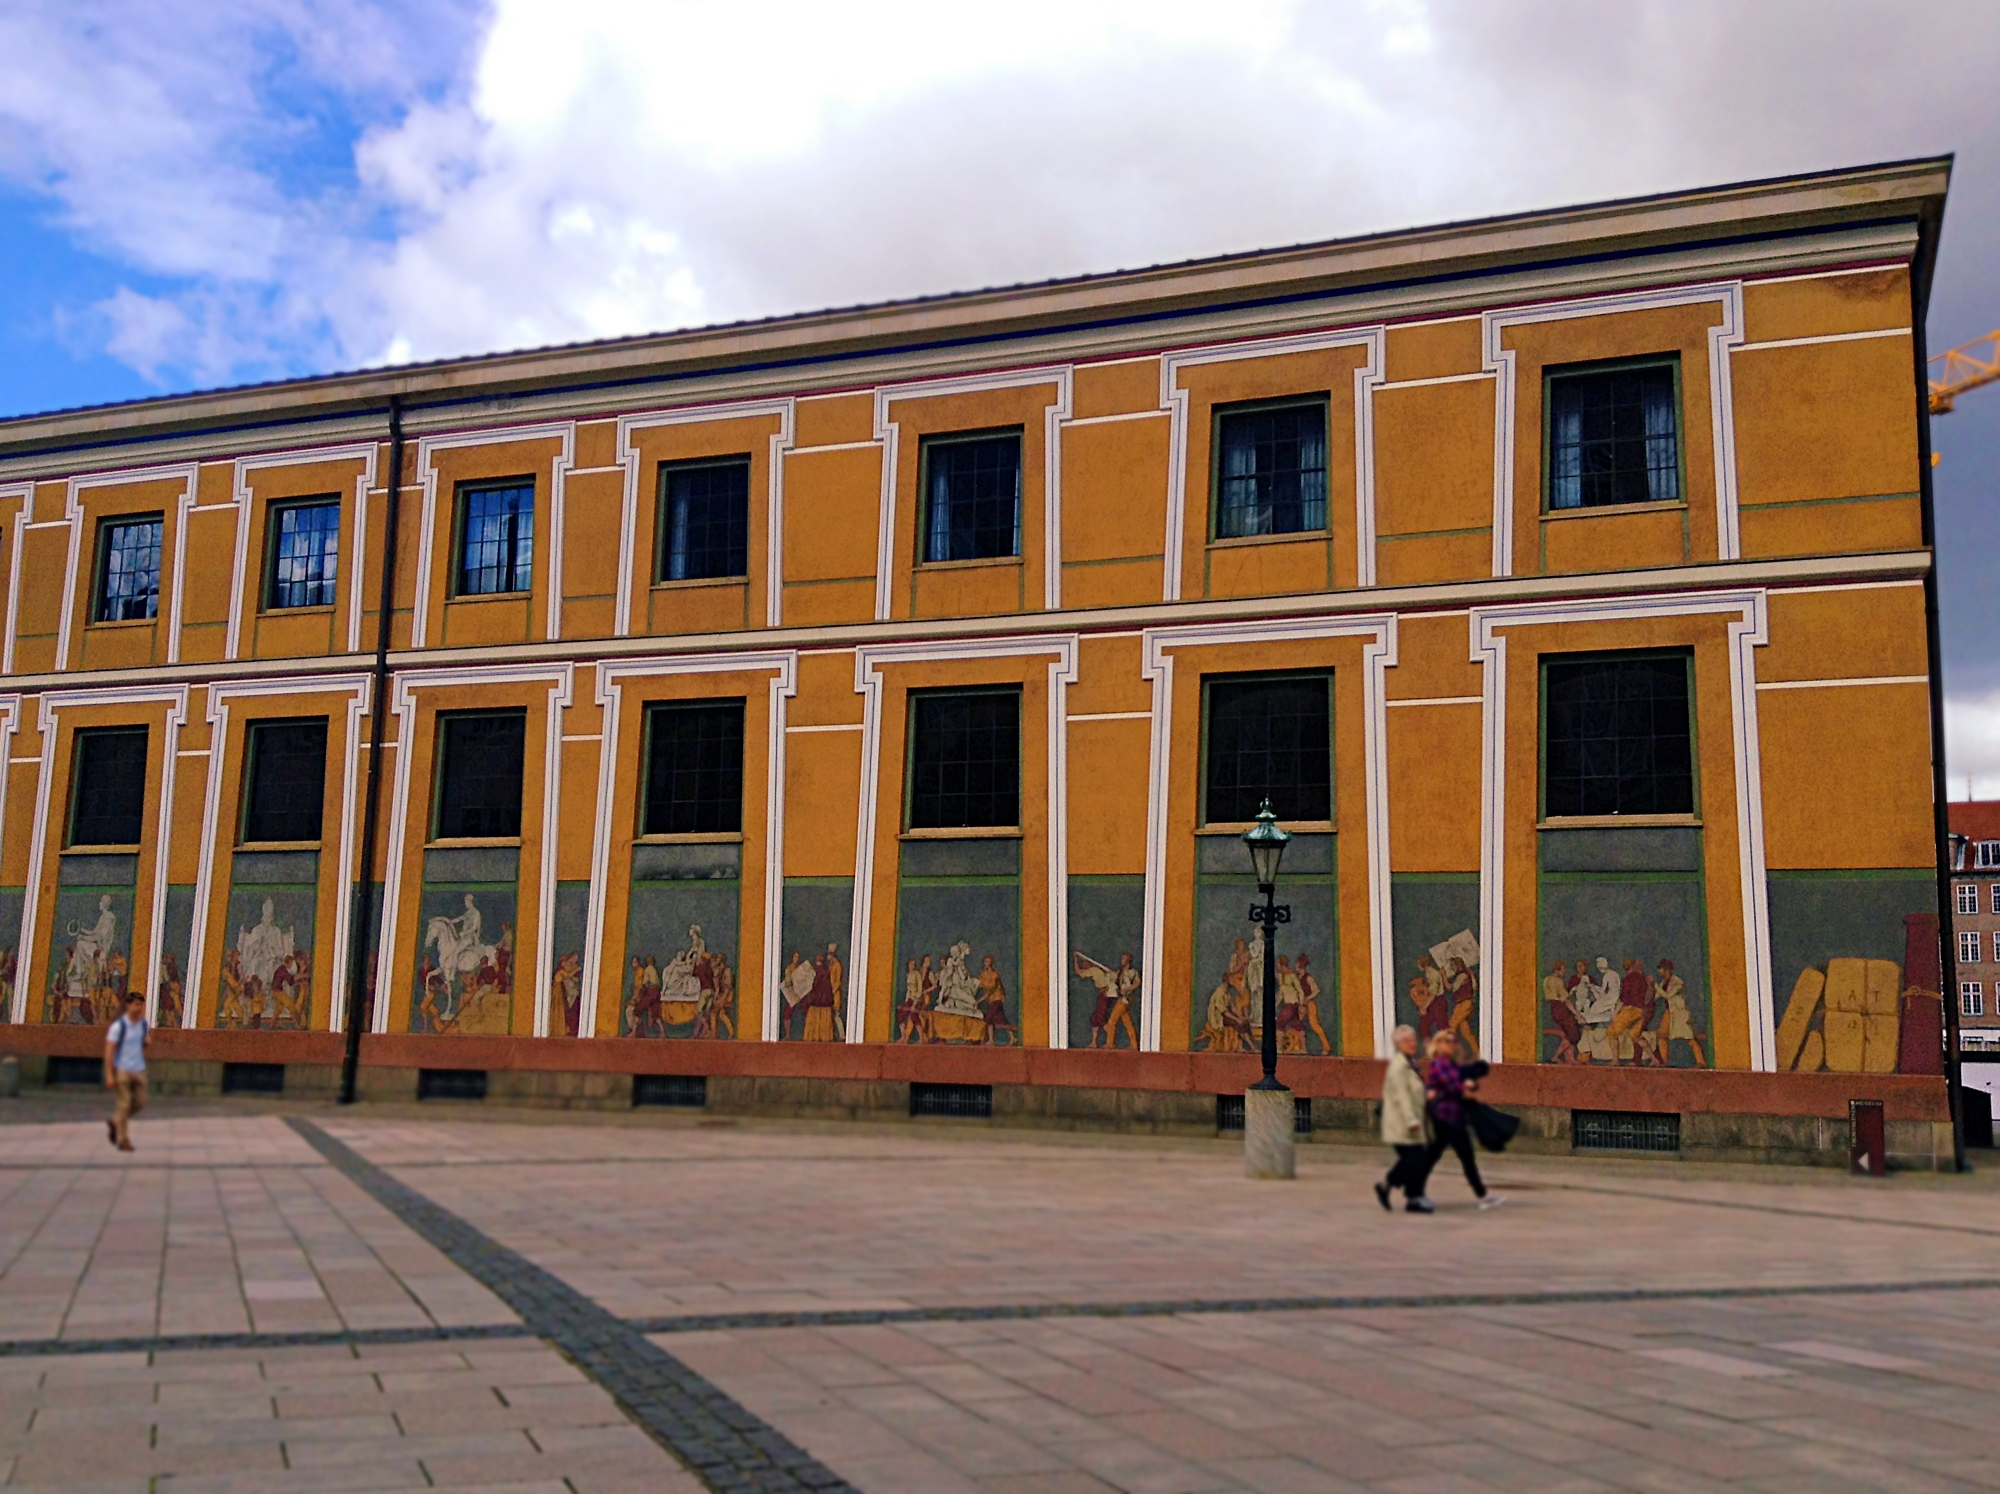 Christiansborg Palace Baroque Architecture